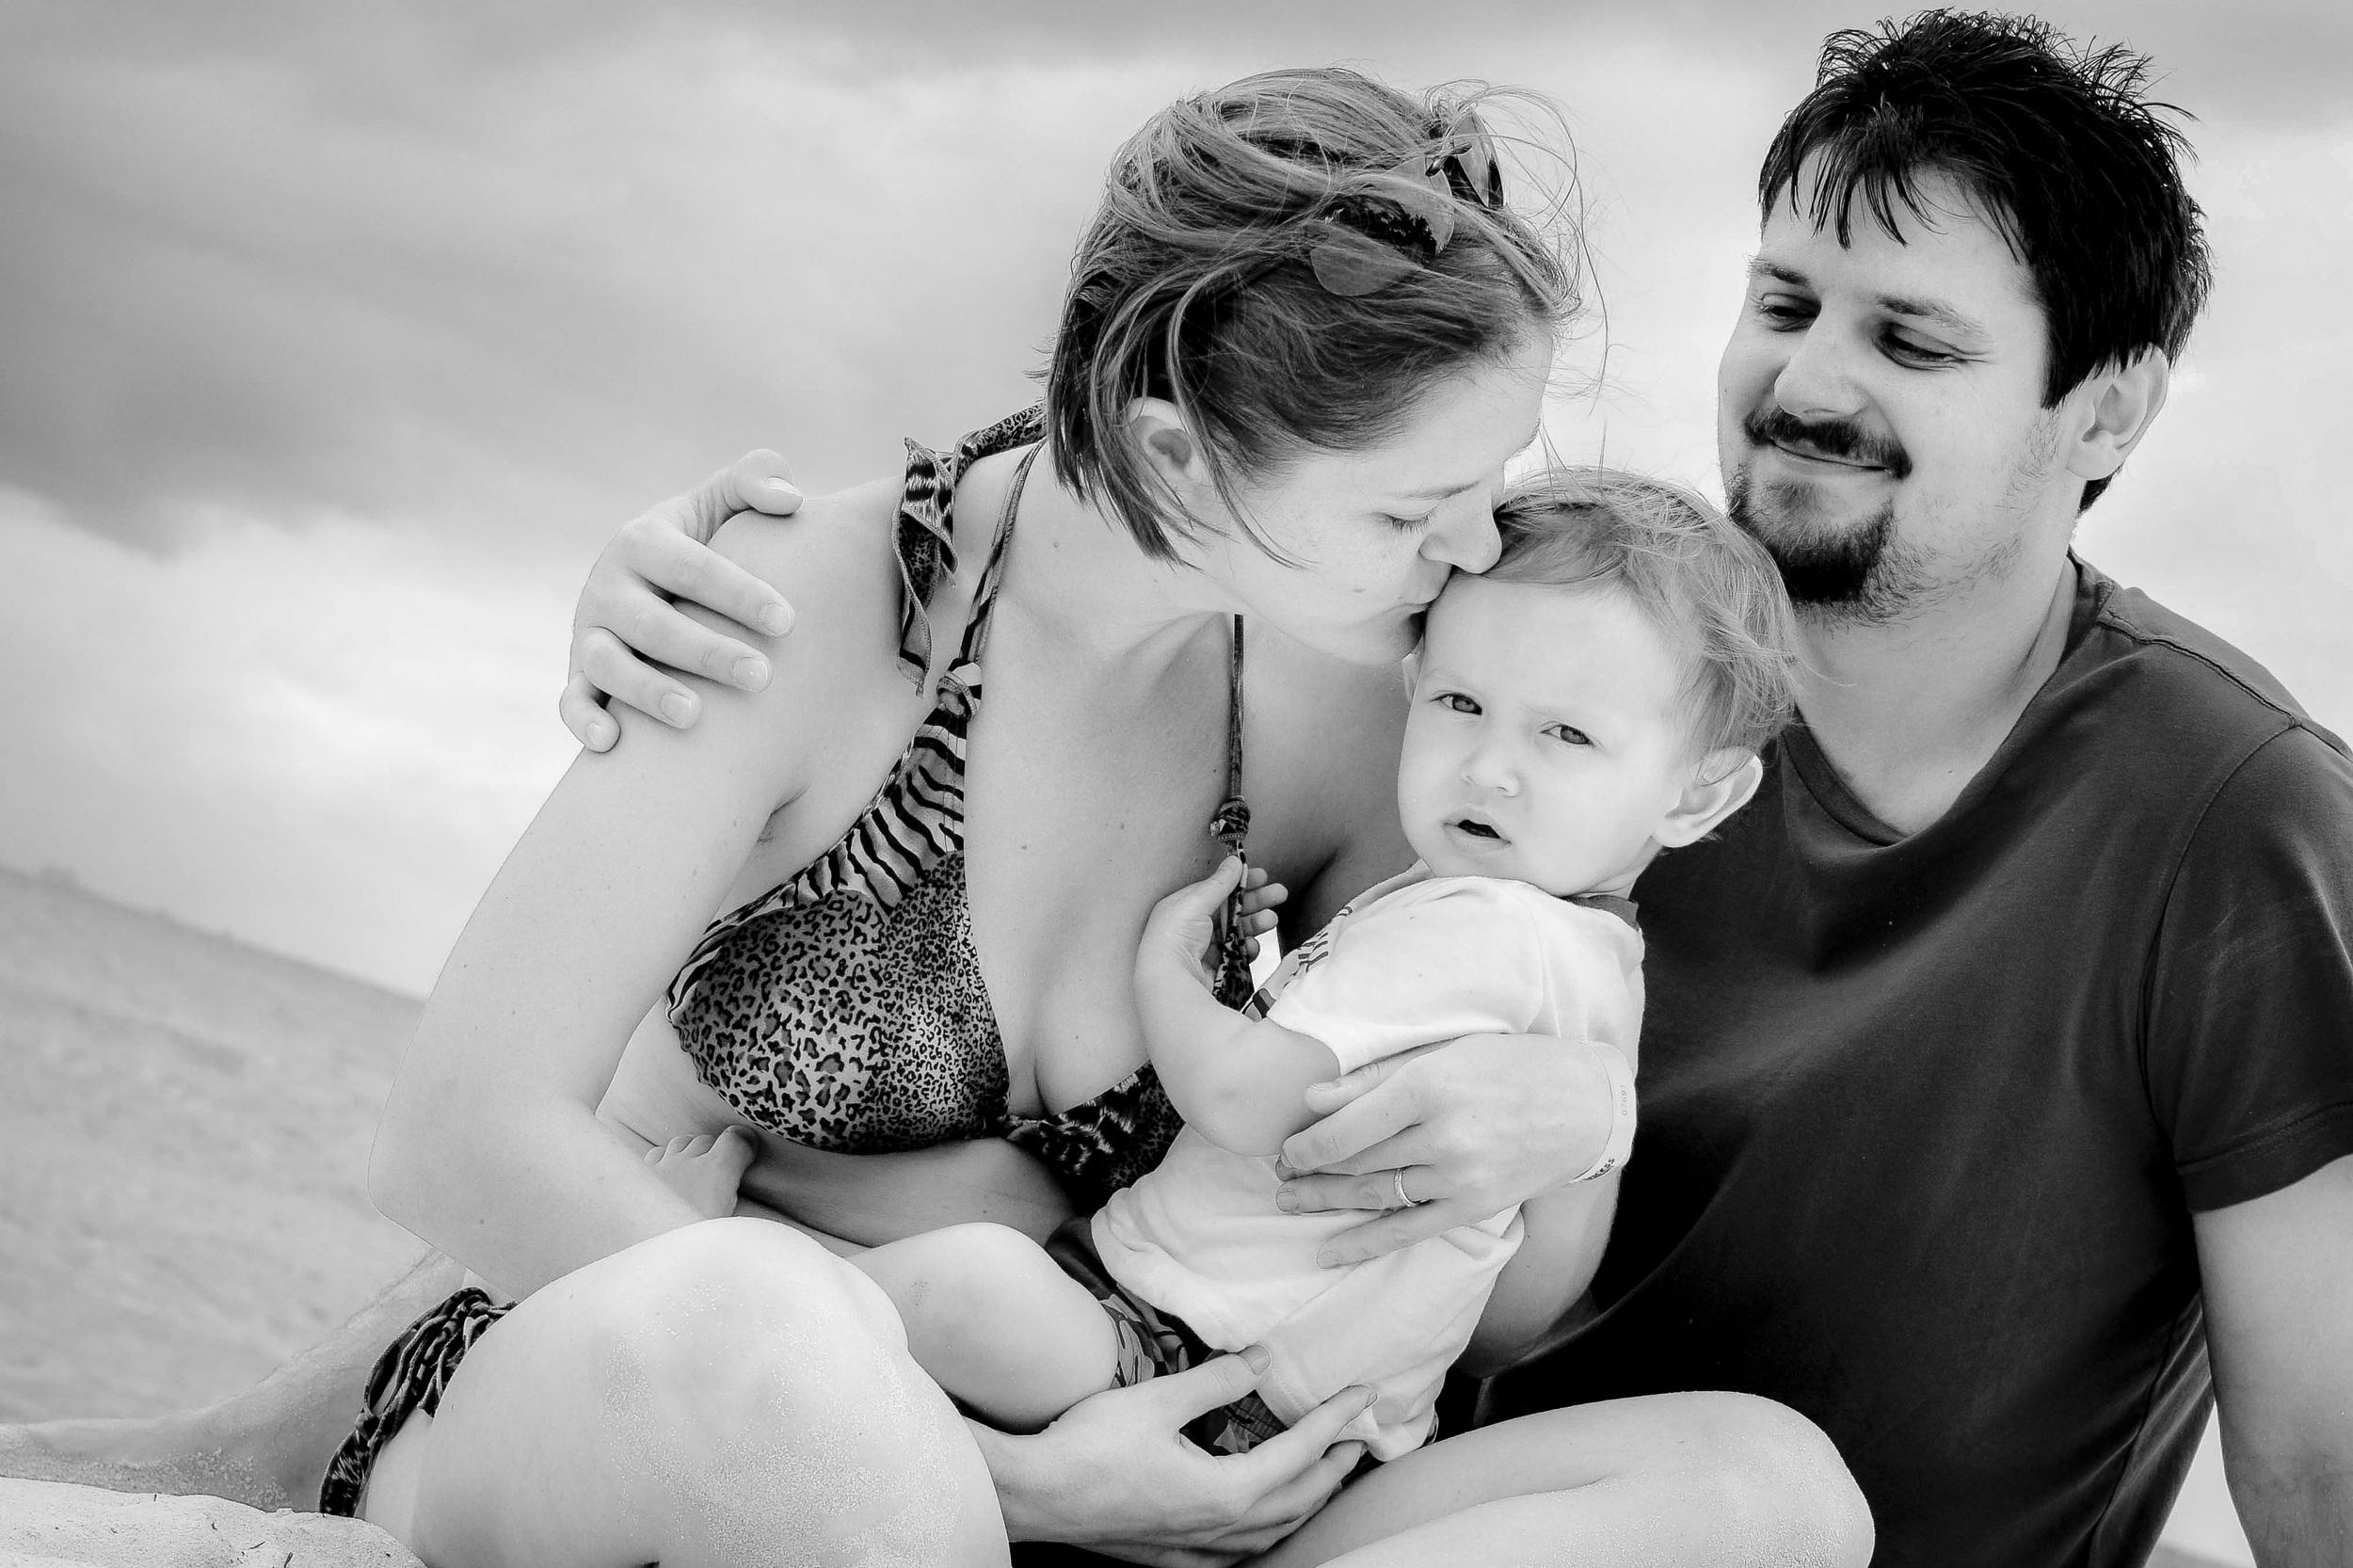 Family on the Mexico beach